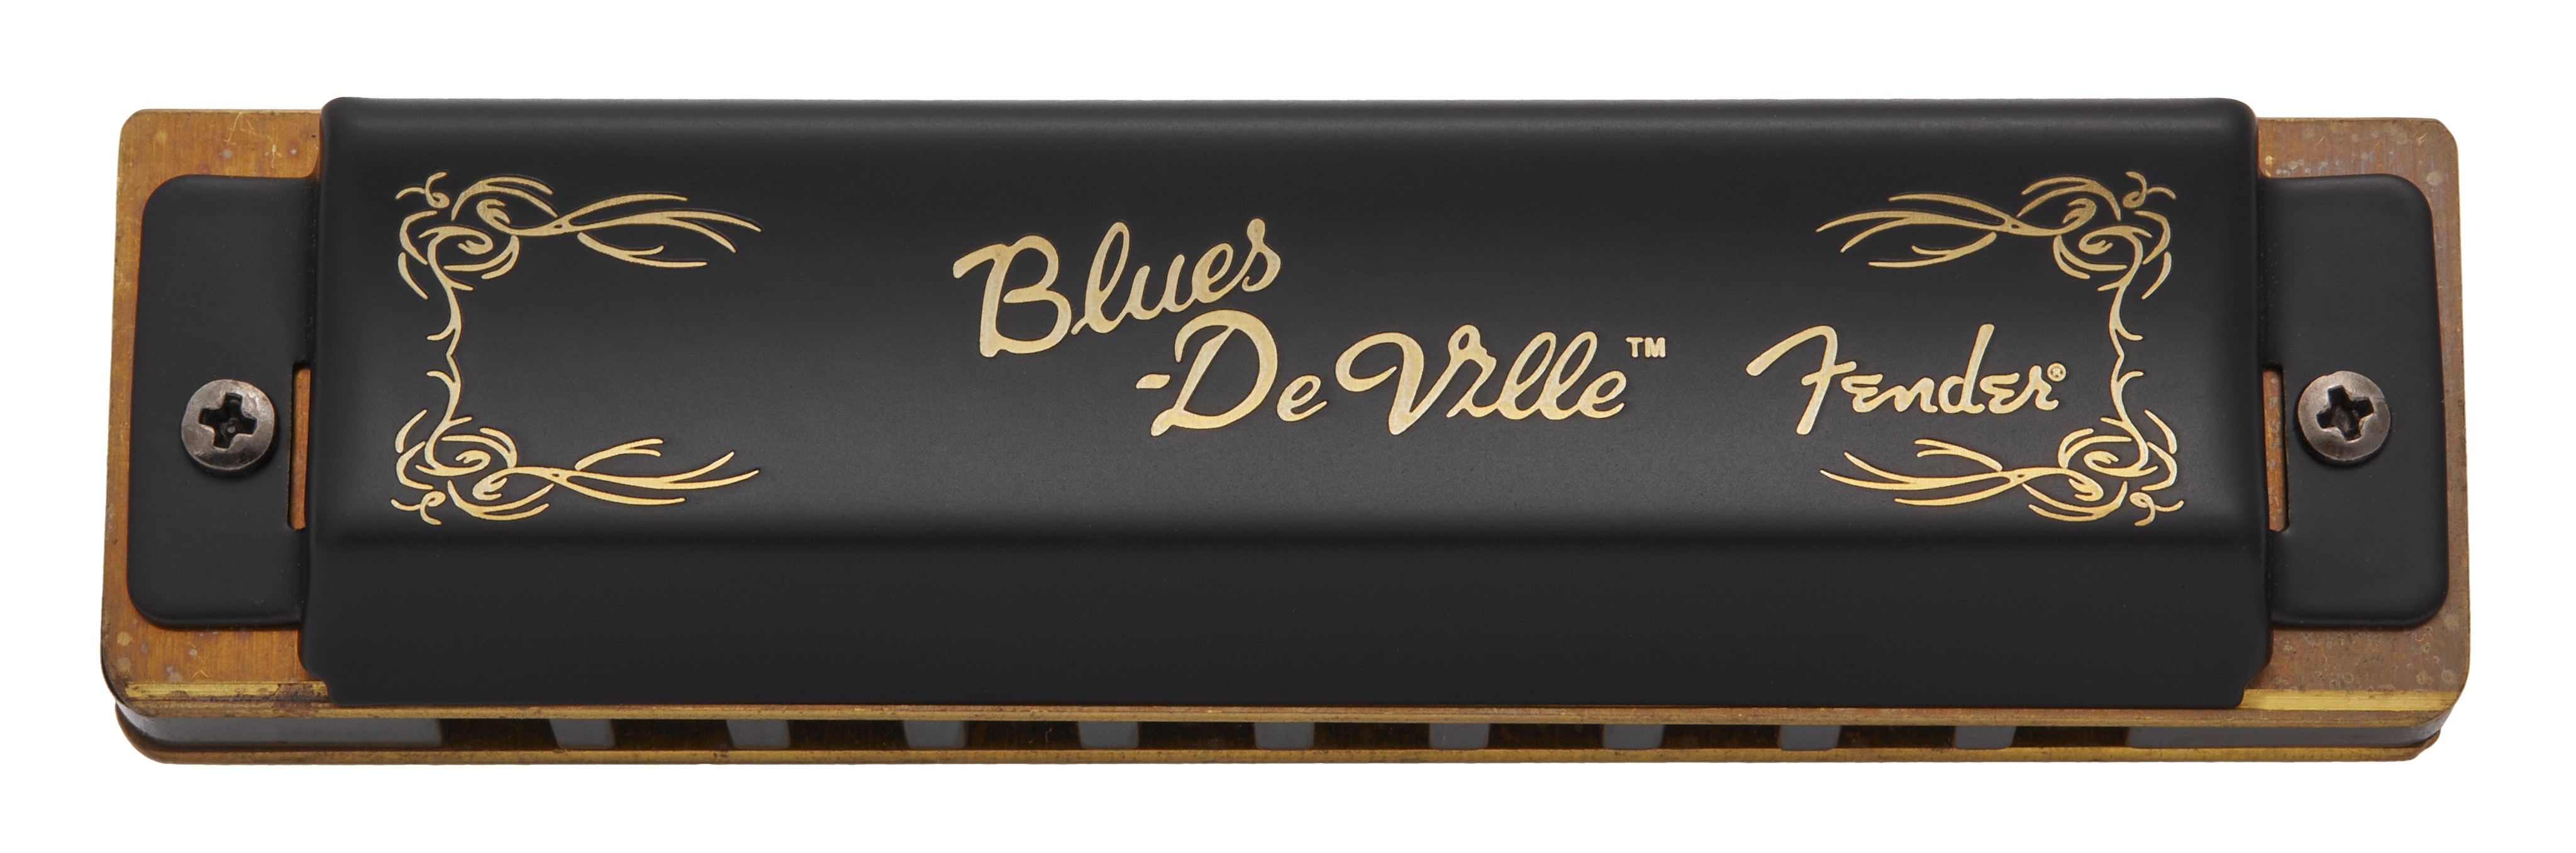 Fender Blues DeVille Key of G